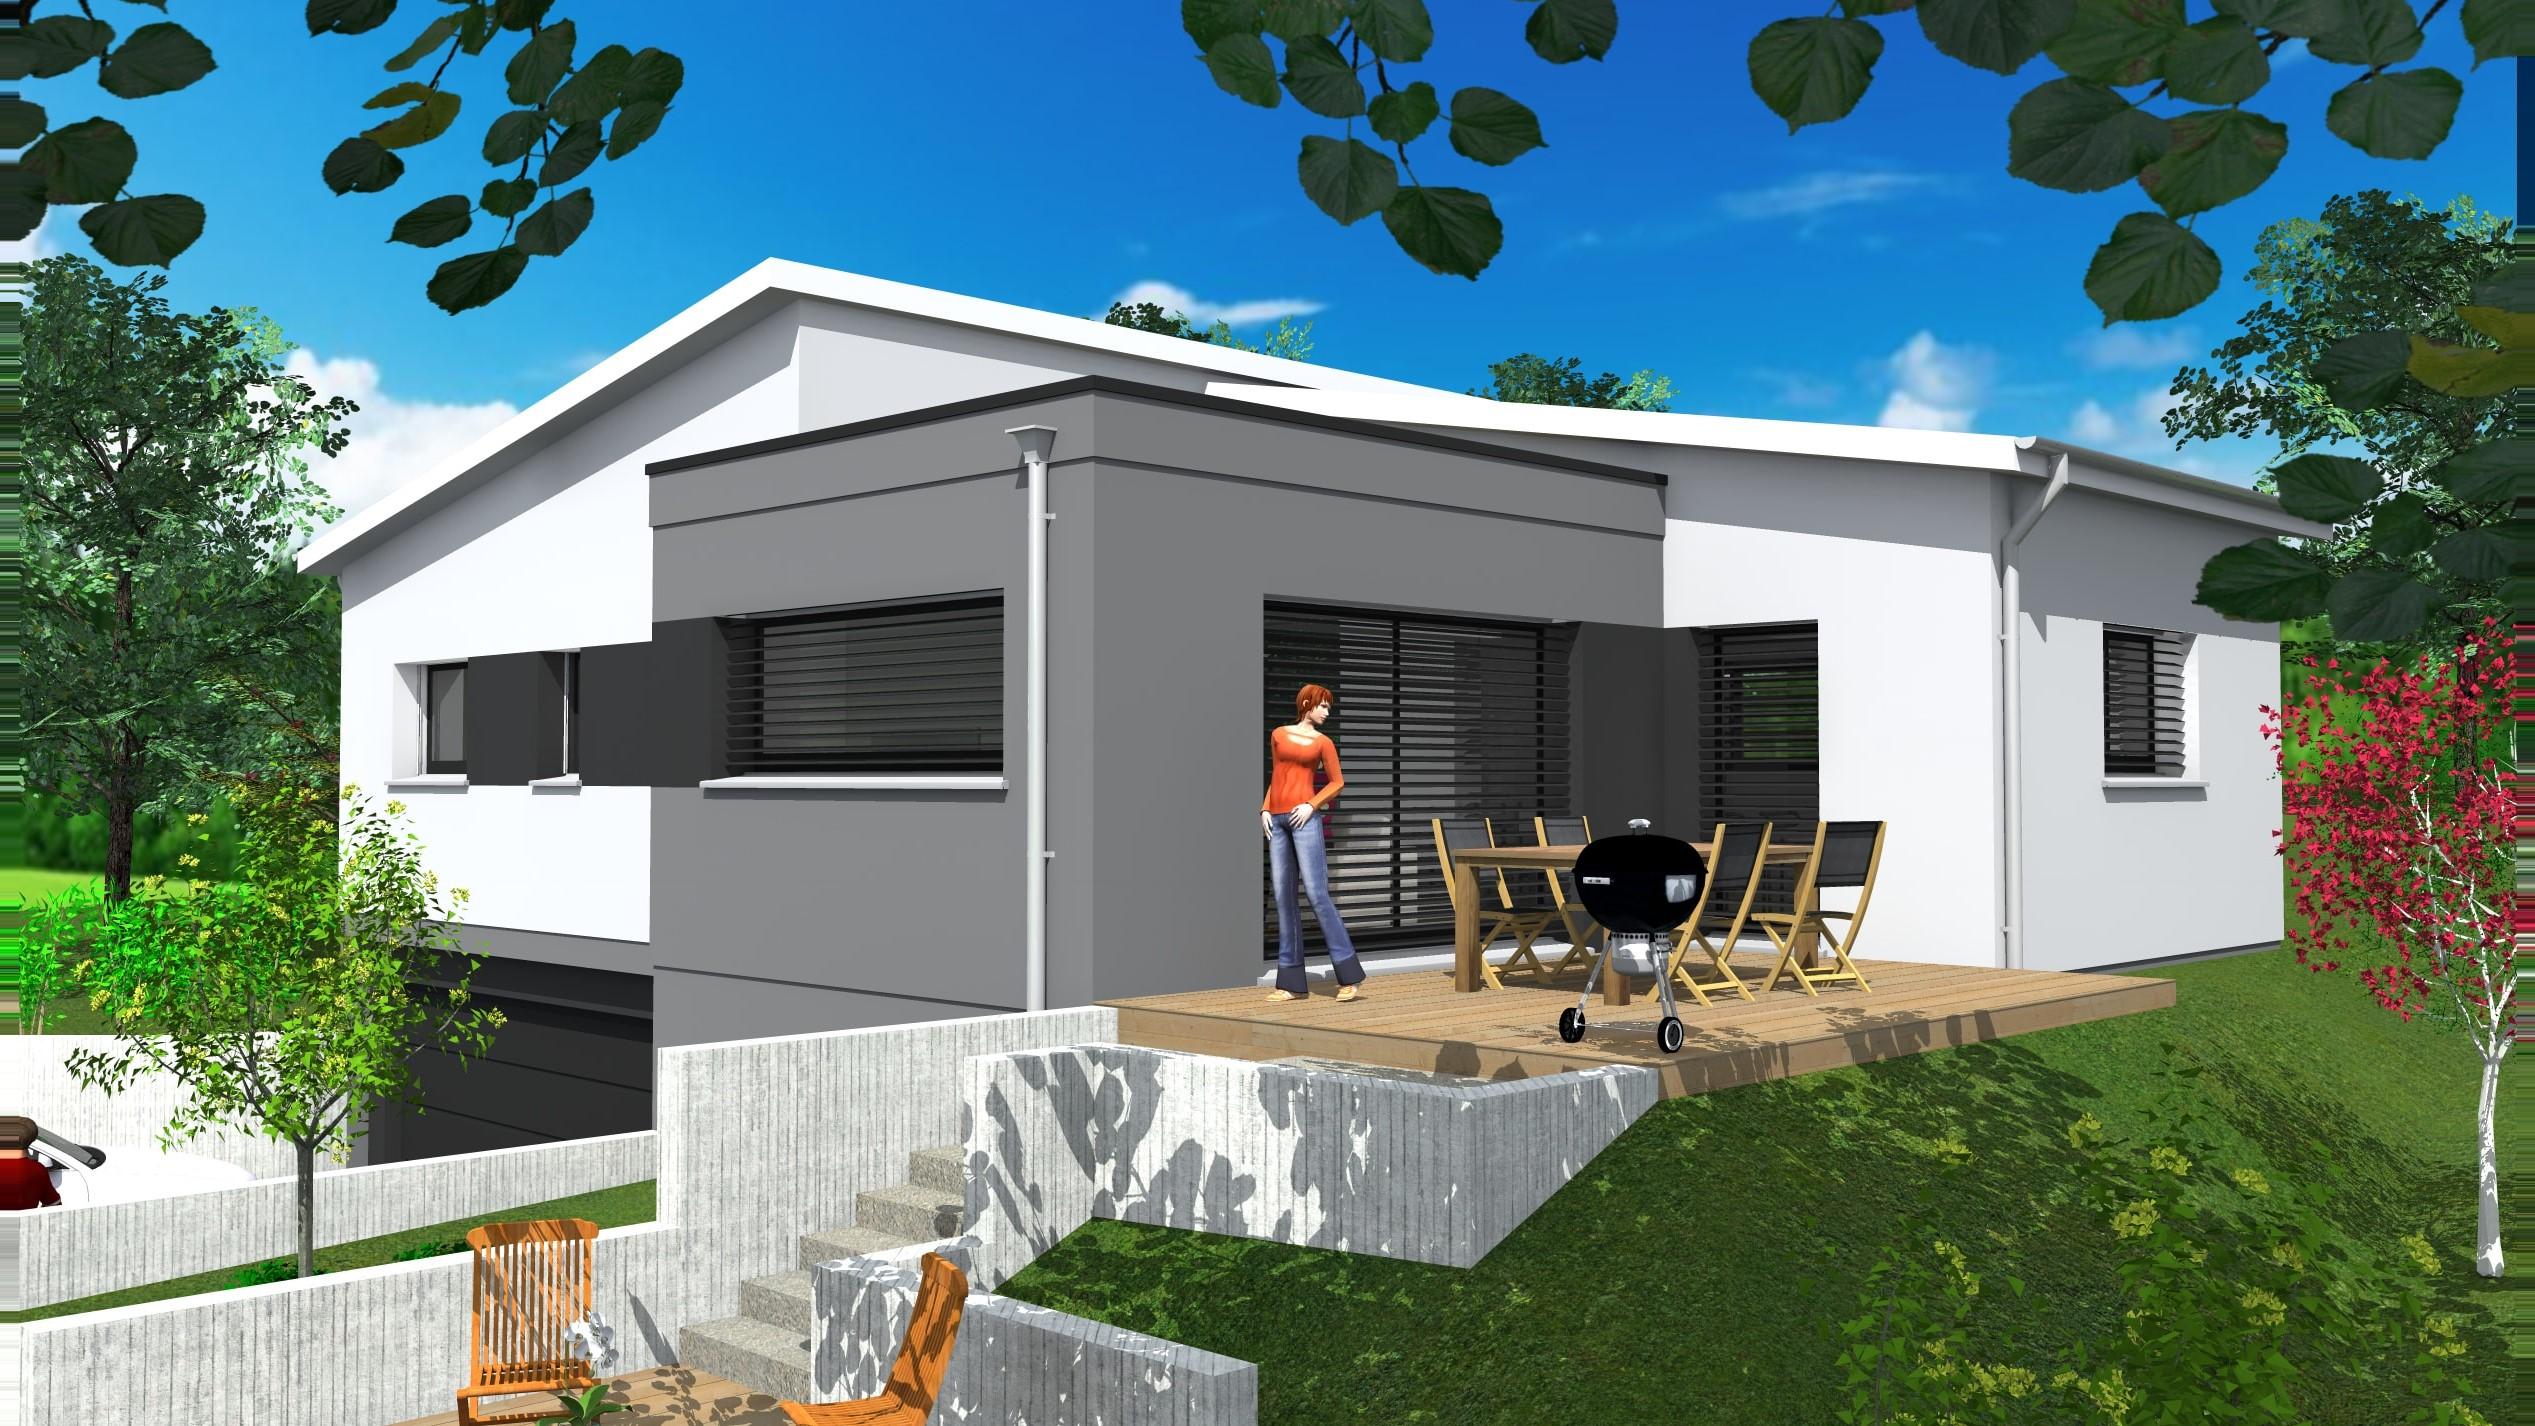 Faade maison moderne exemple plan maison n8 facade for 2 maison parc court